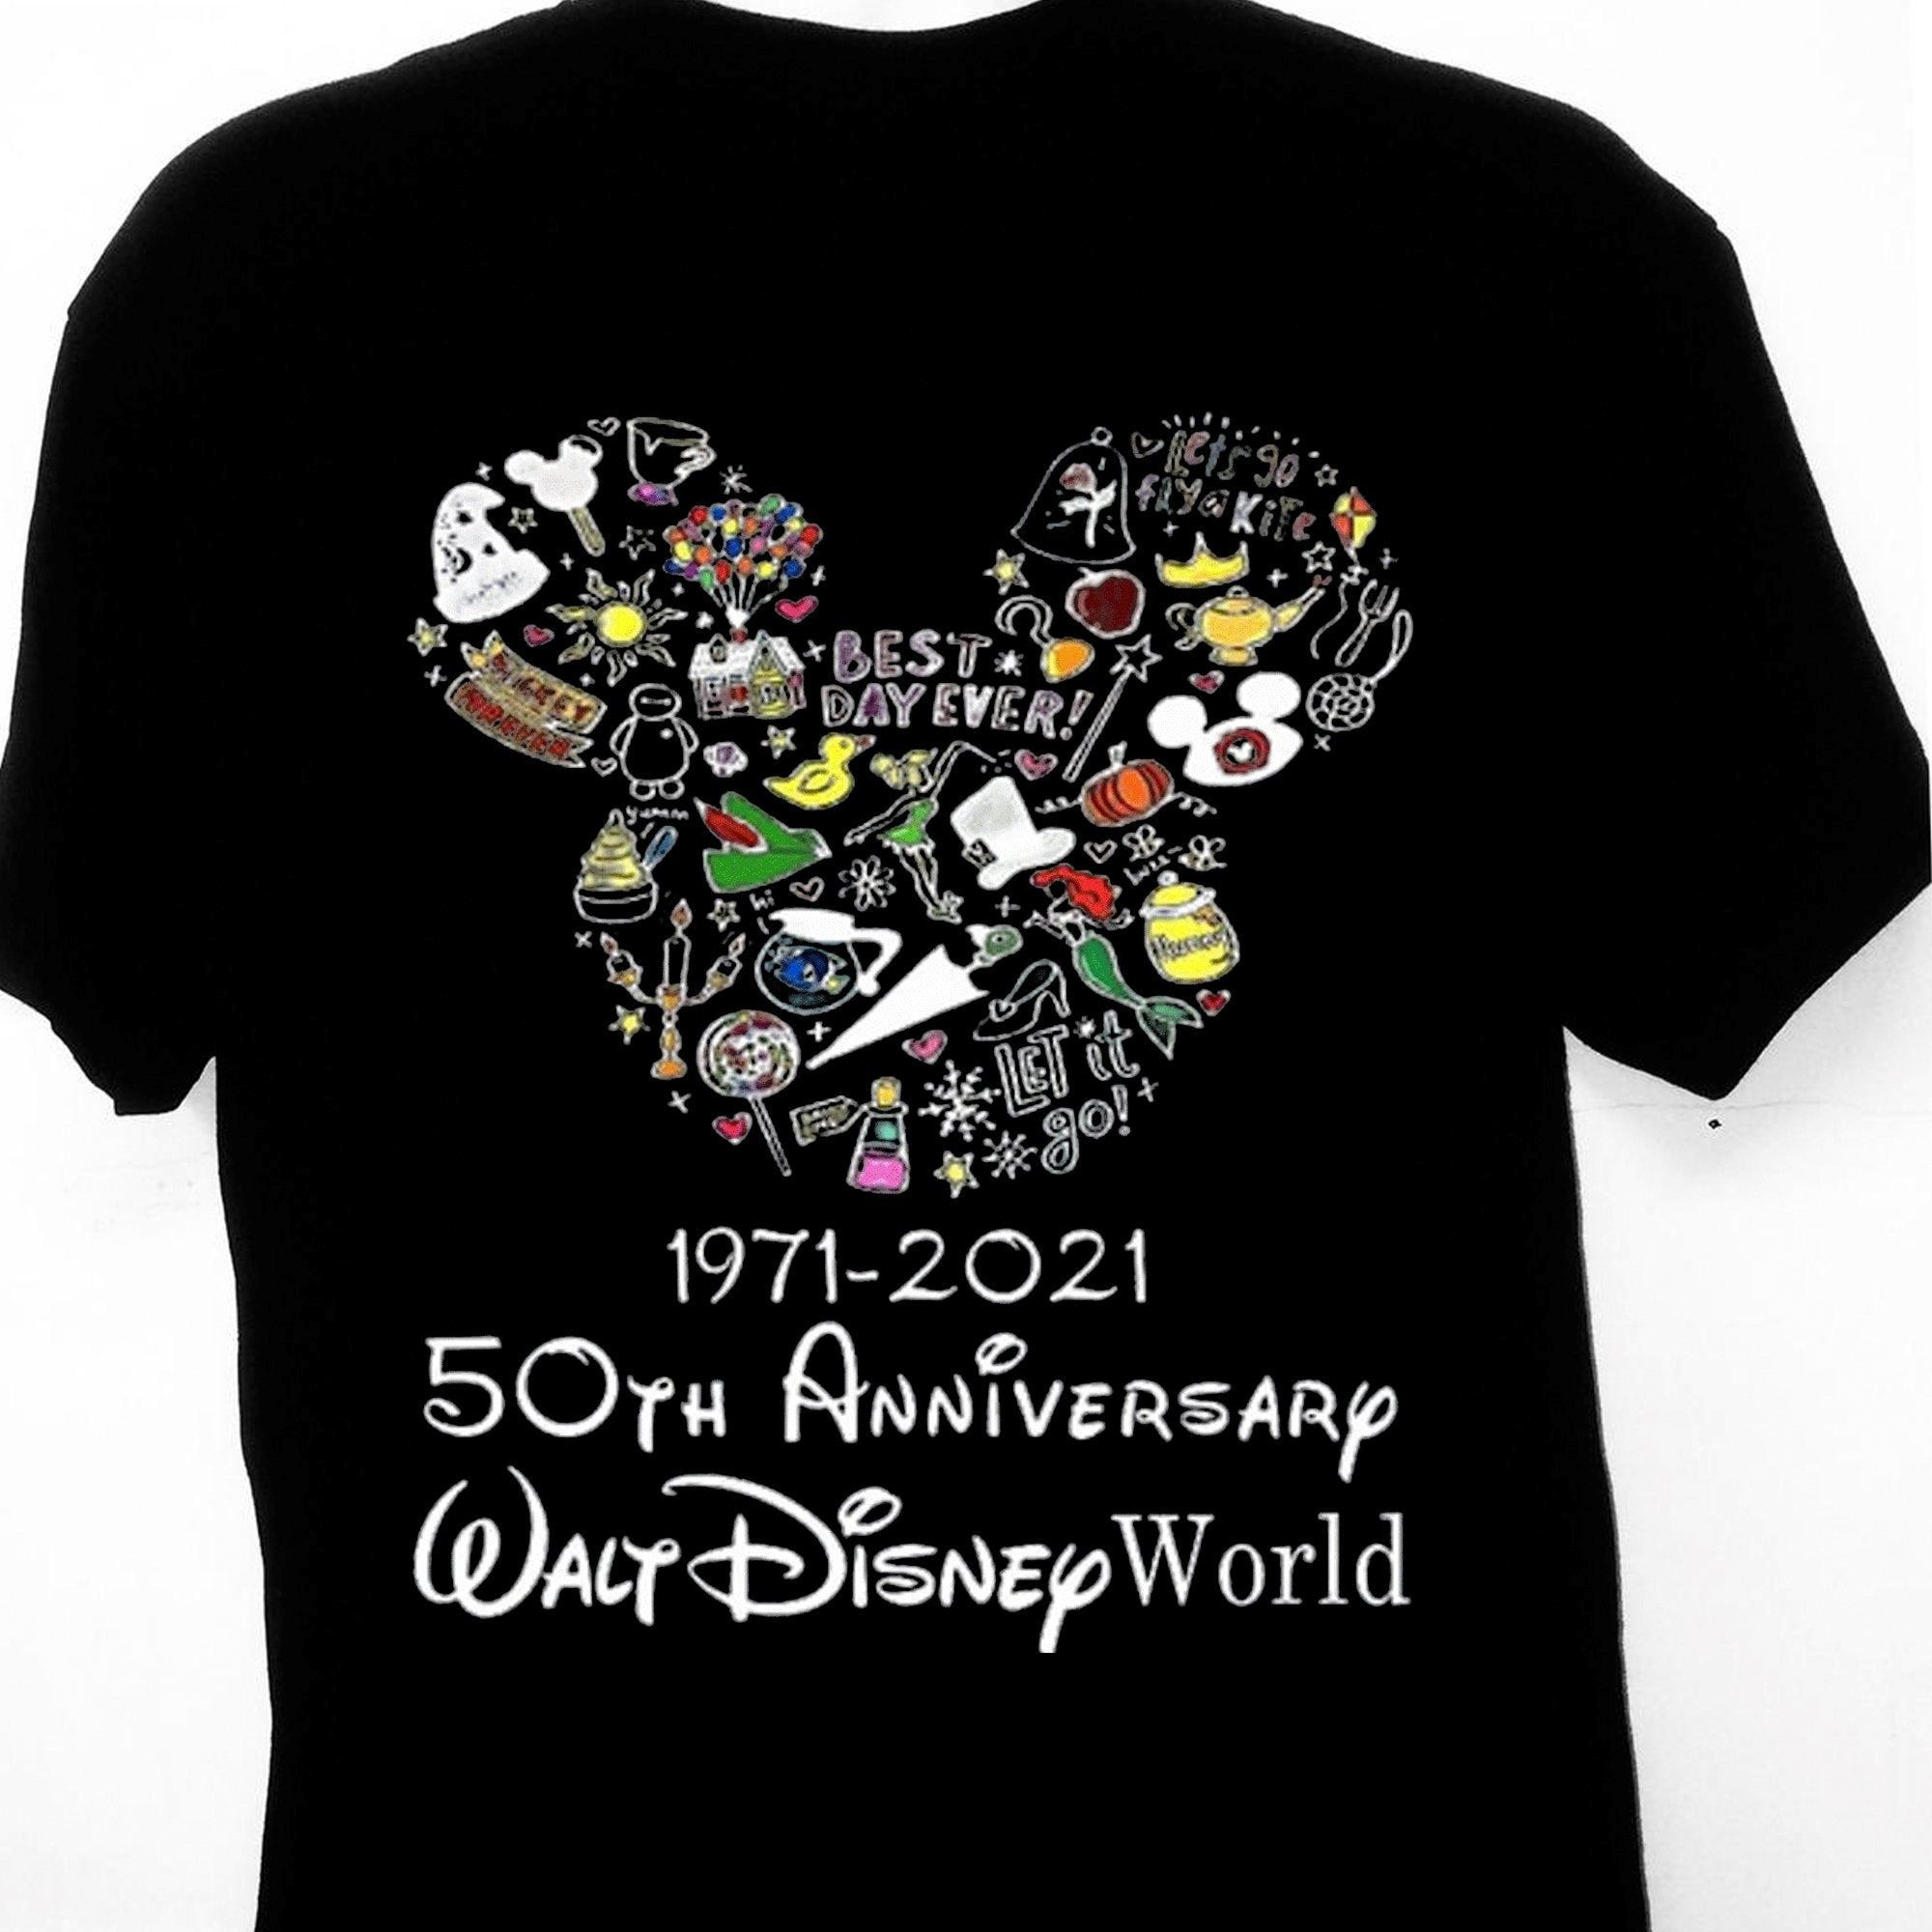 Mickey Mouse Walt Disney World 50th Anniversary 1971 2021 Shirt Minnie Mouse Gift Tee For Men Women Friends Unisex T-shirt